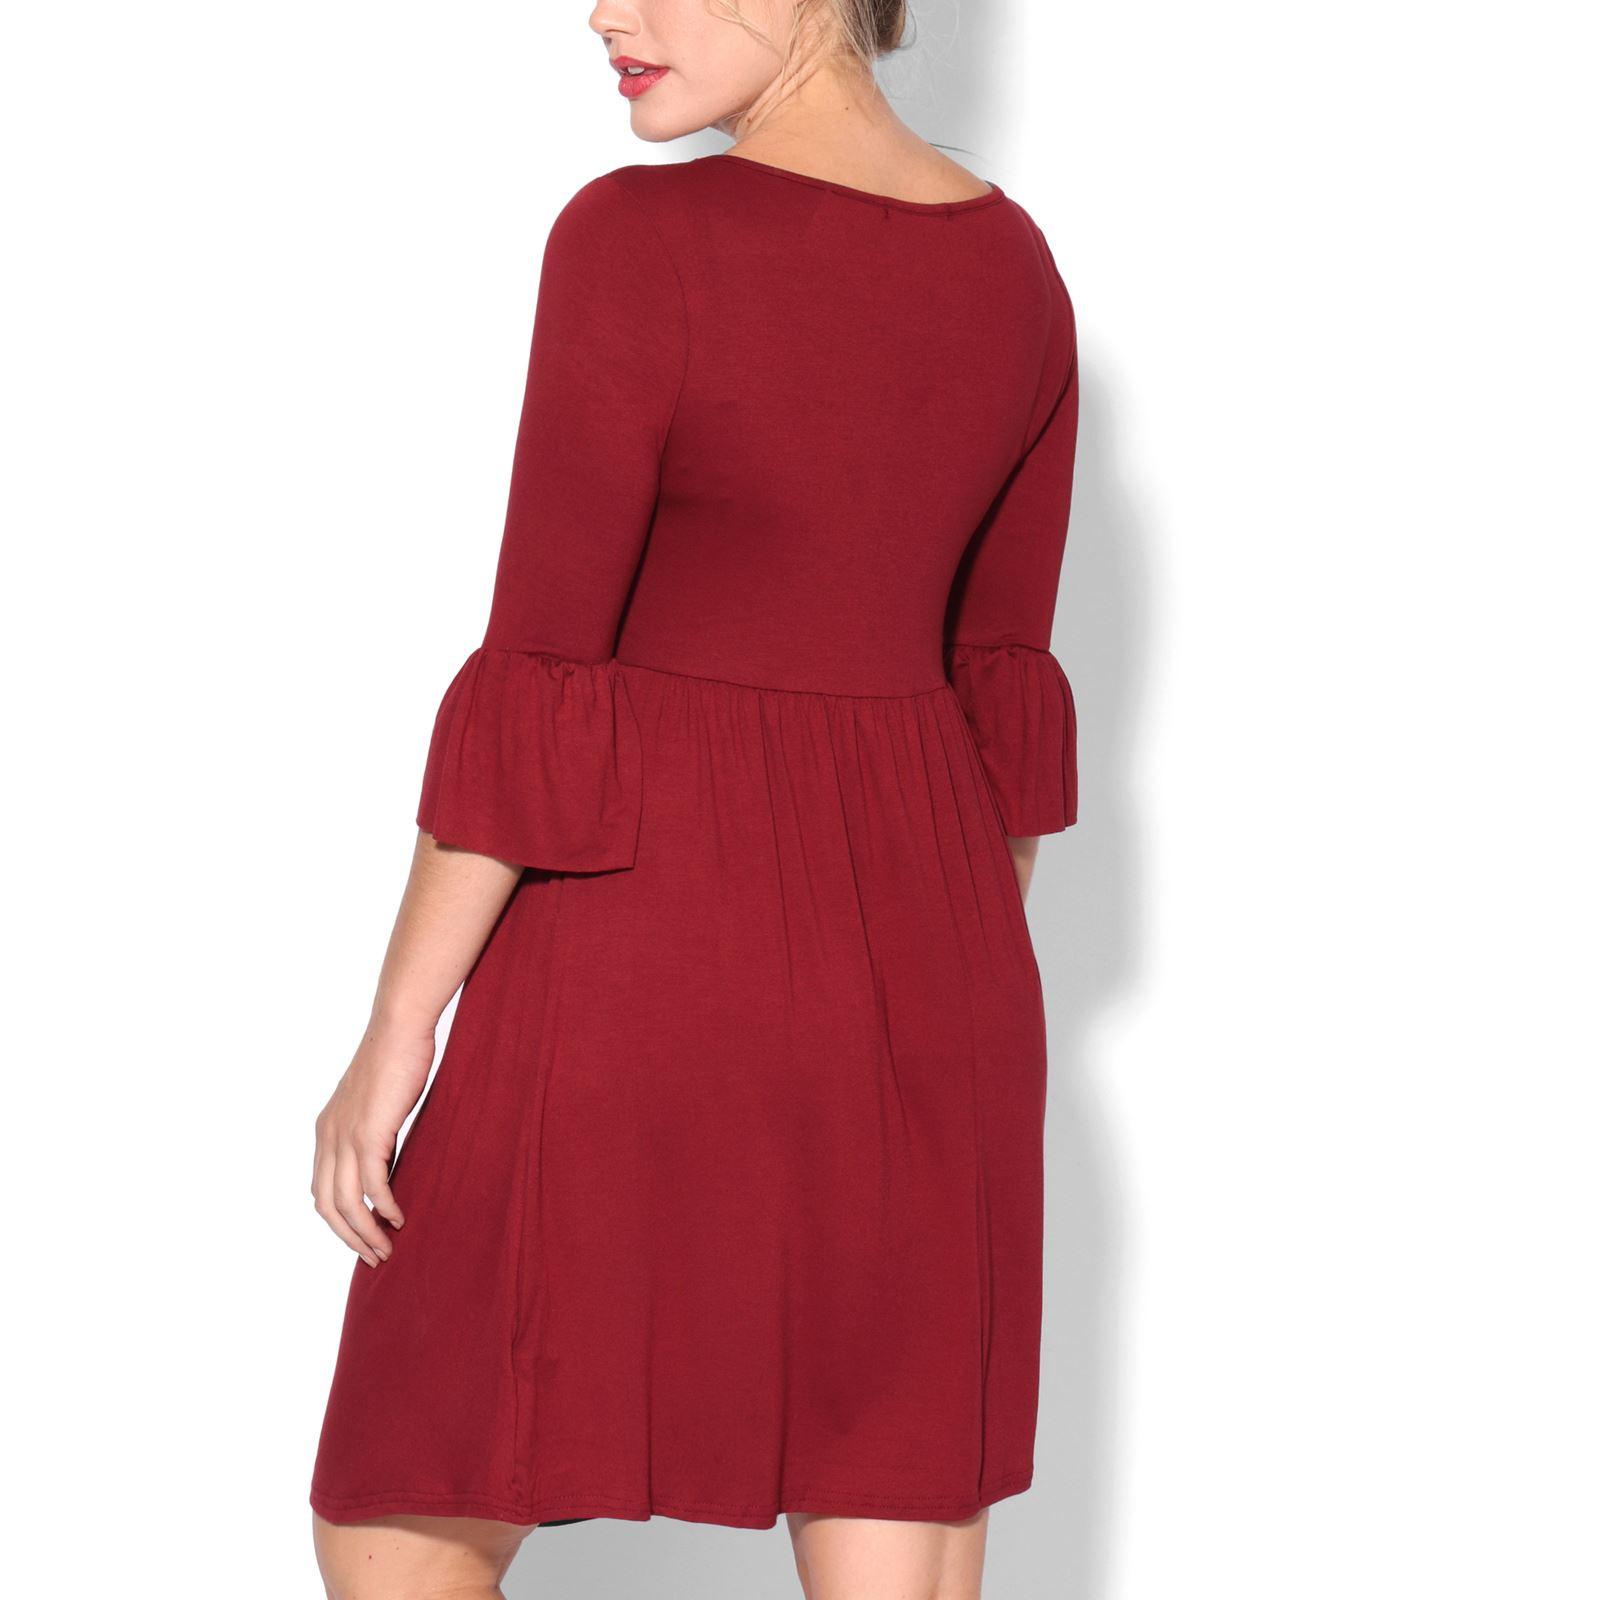 Krisp Umstandsmode Kurzarm Shirtkleid Midi Kleid Tunika